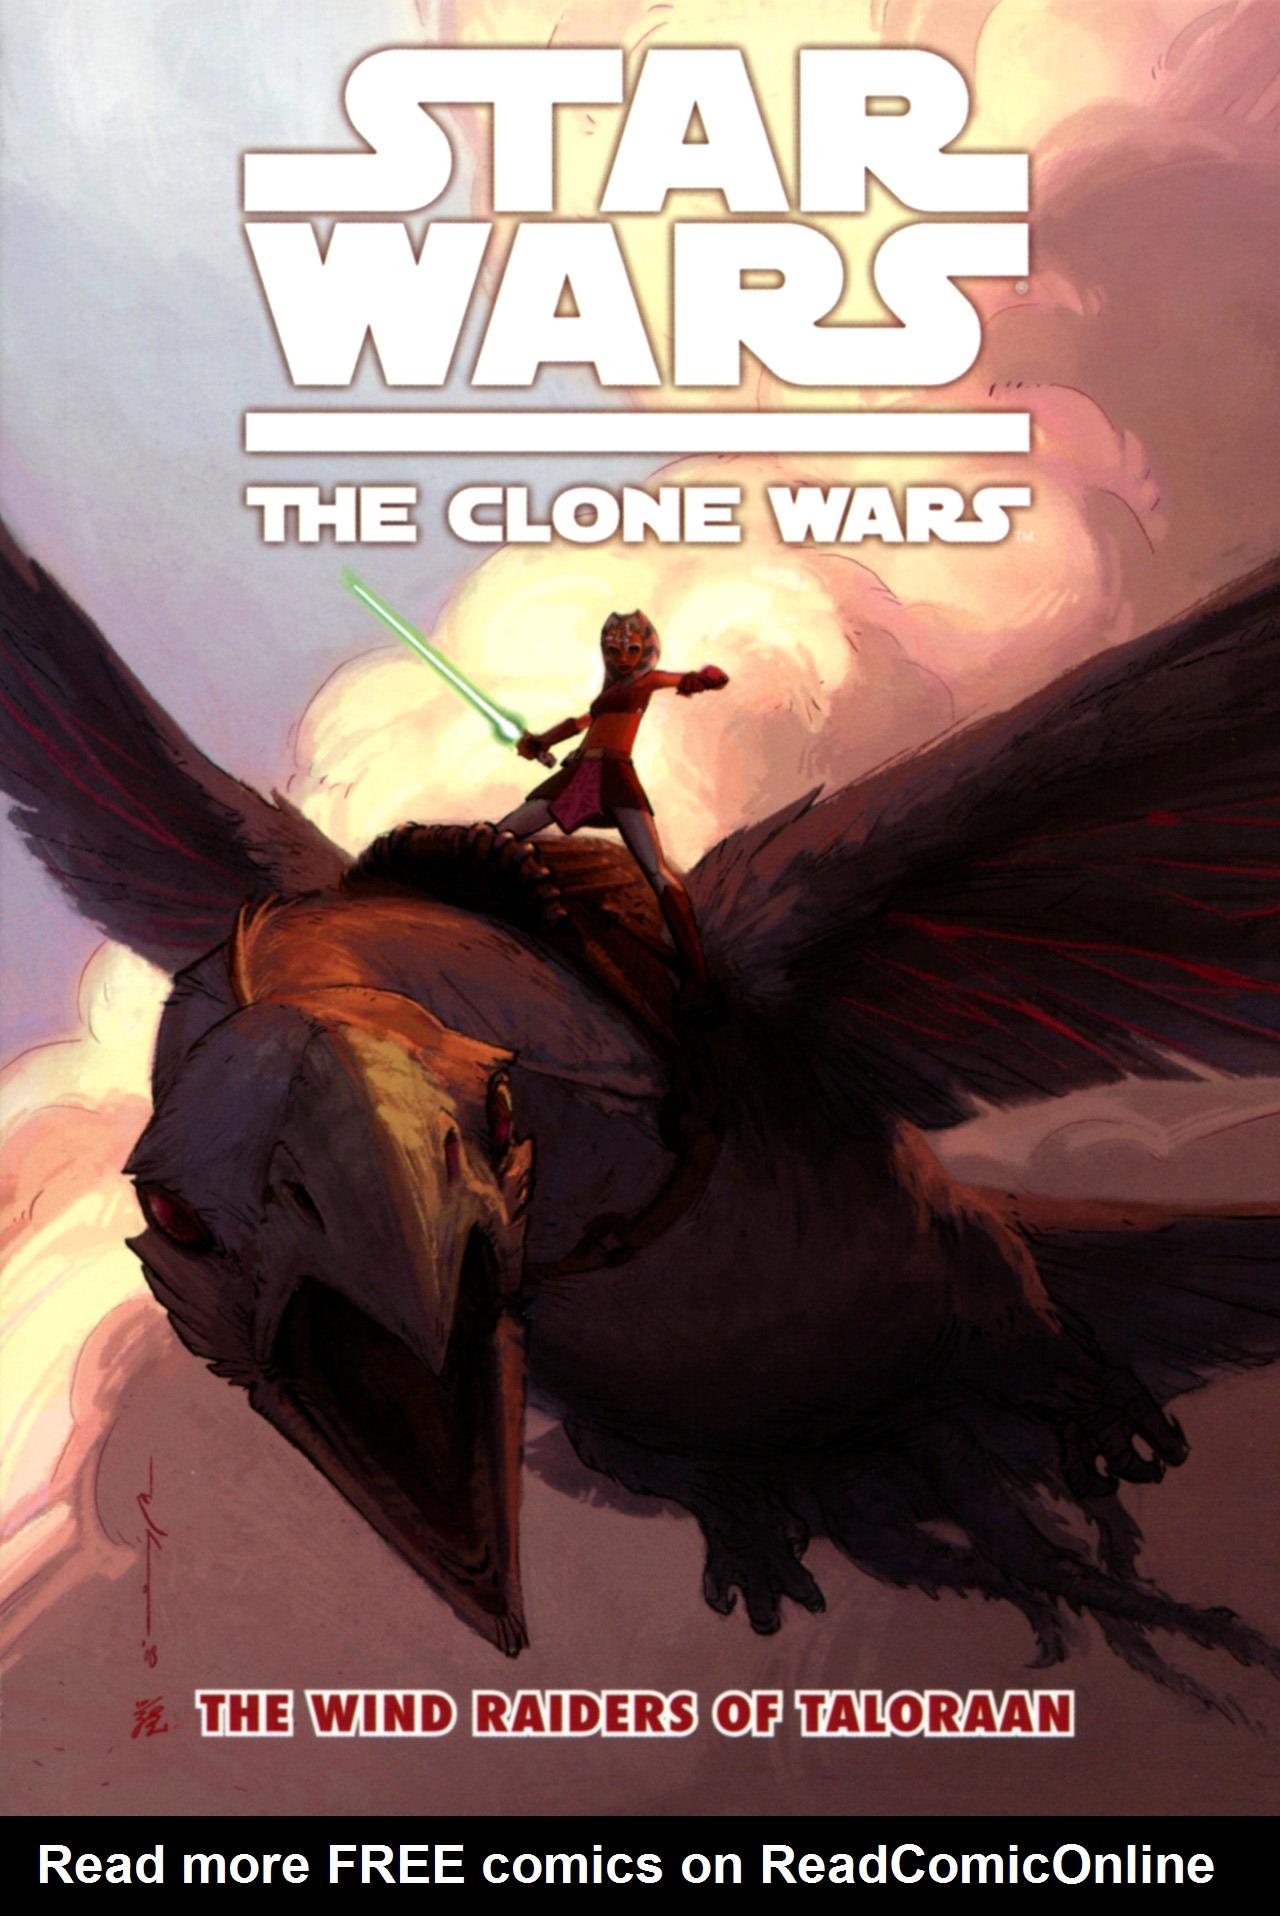 Star Wars: The Clone Wars - The Wind Raiders of Taloraan 1 Page 1